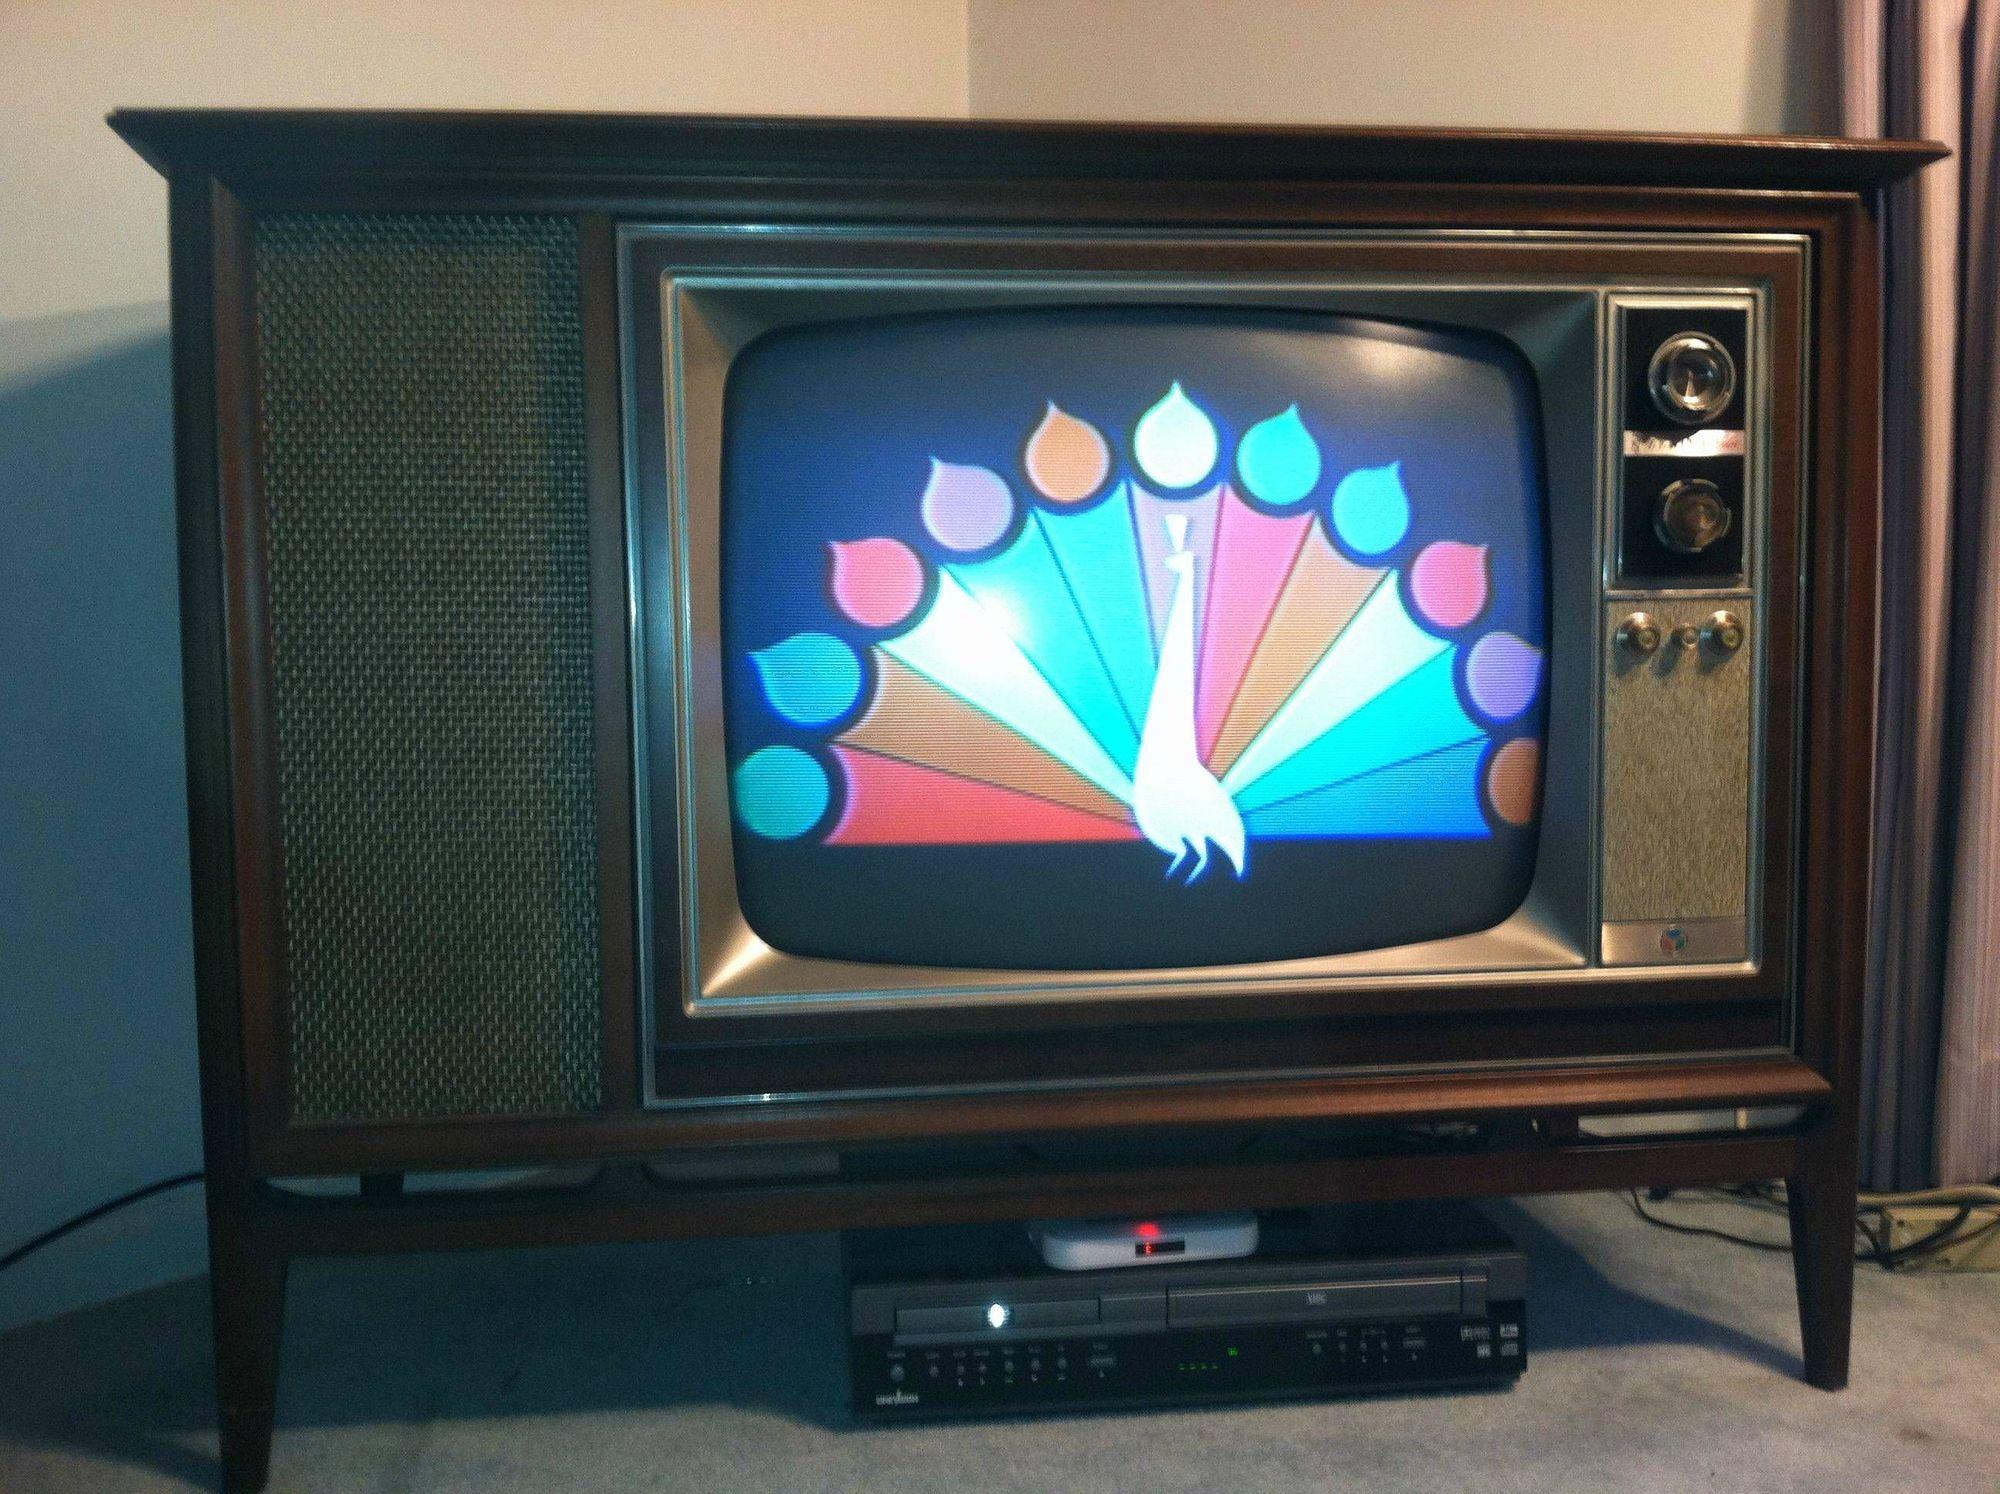 TV 1960 - Begini Sejarah Perkembangan Televisi